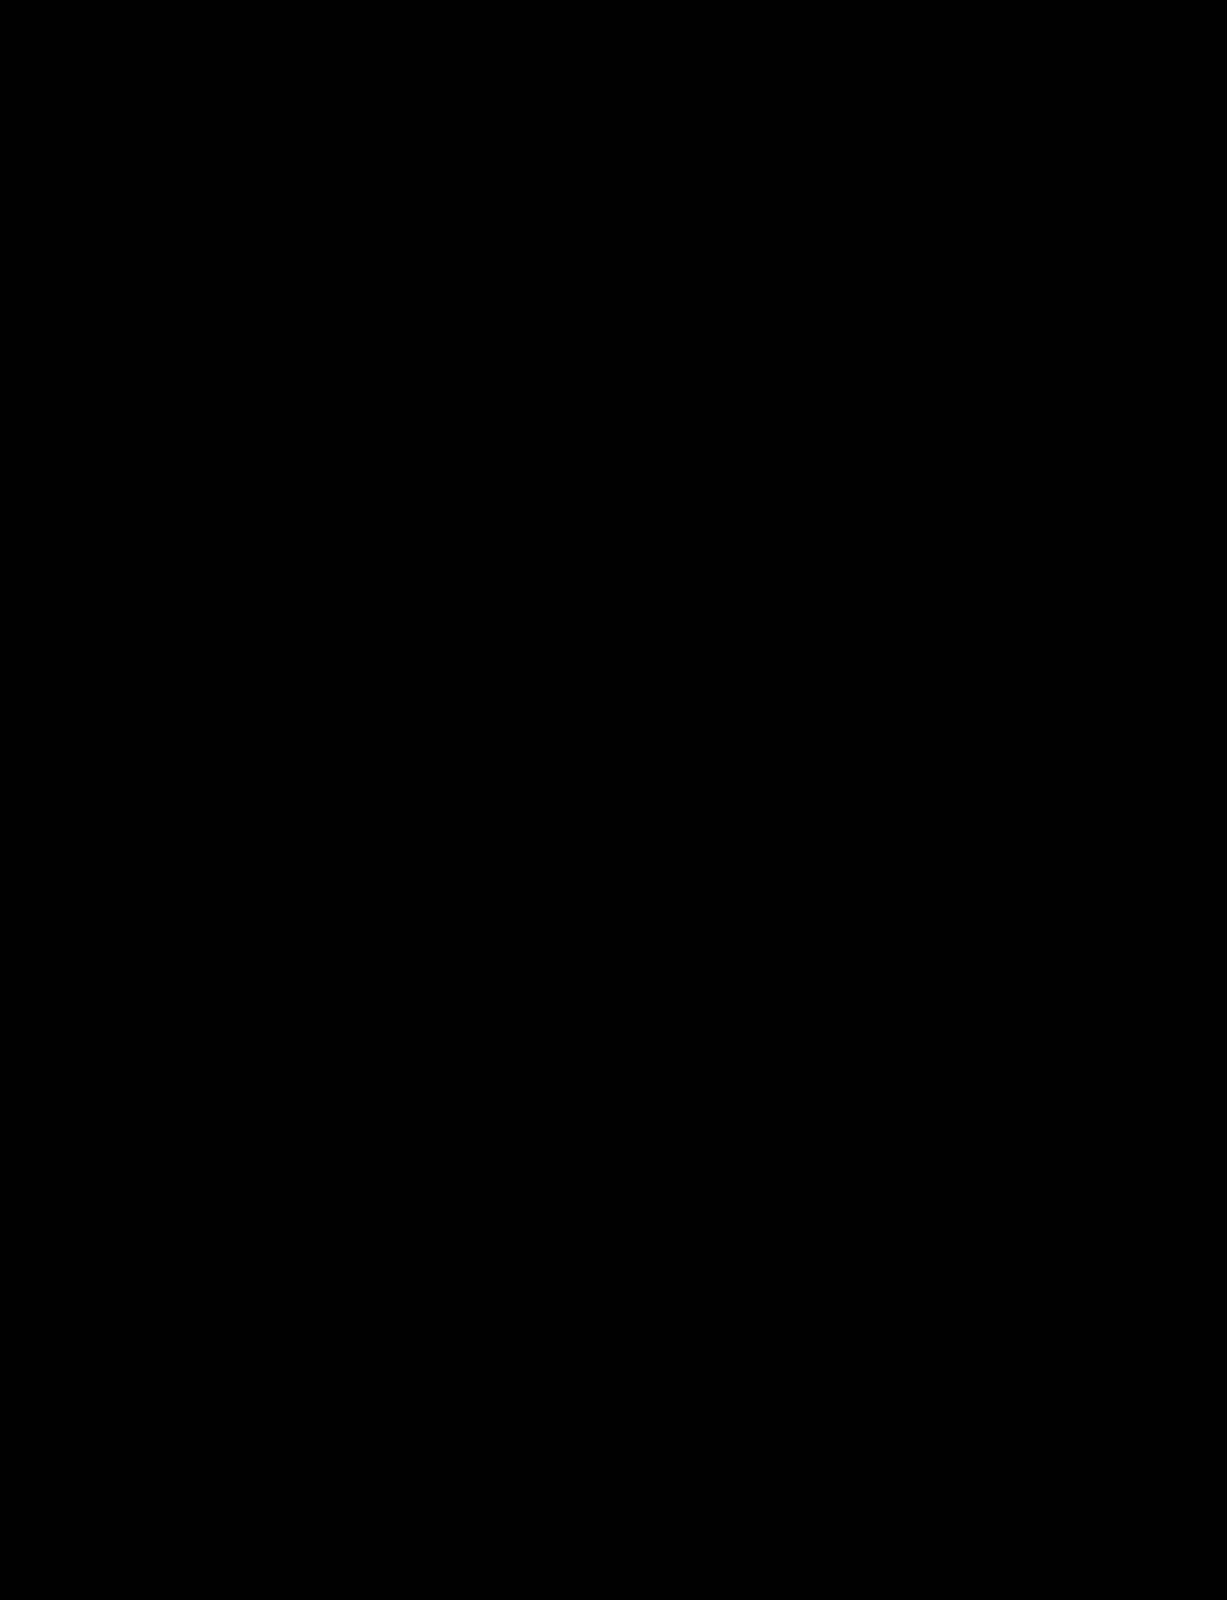 1227x1600 Thanksgiving Black And White Turkey Borders